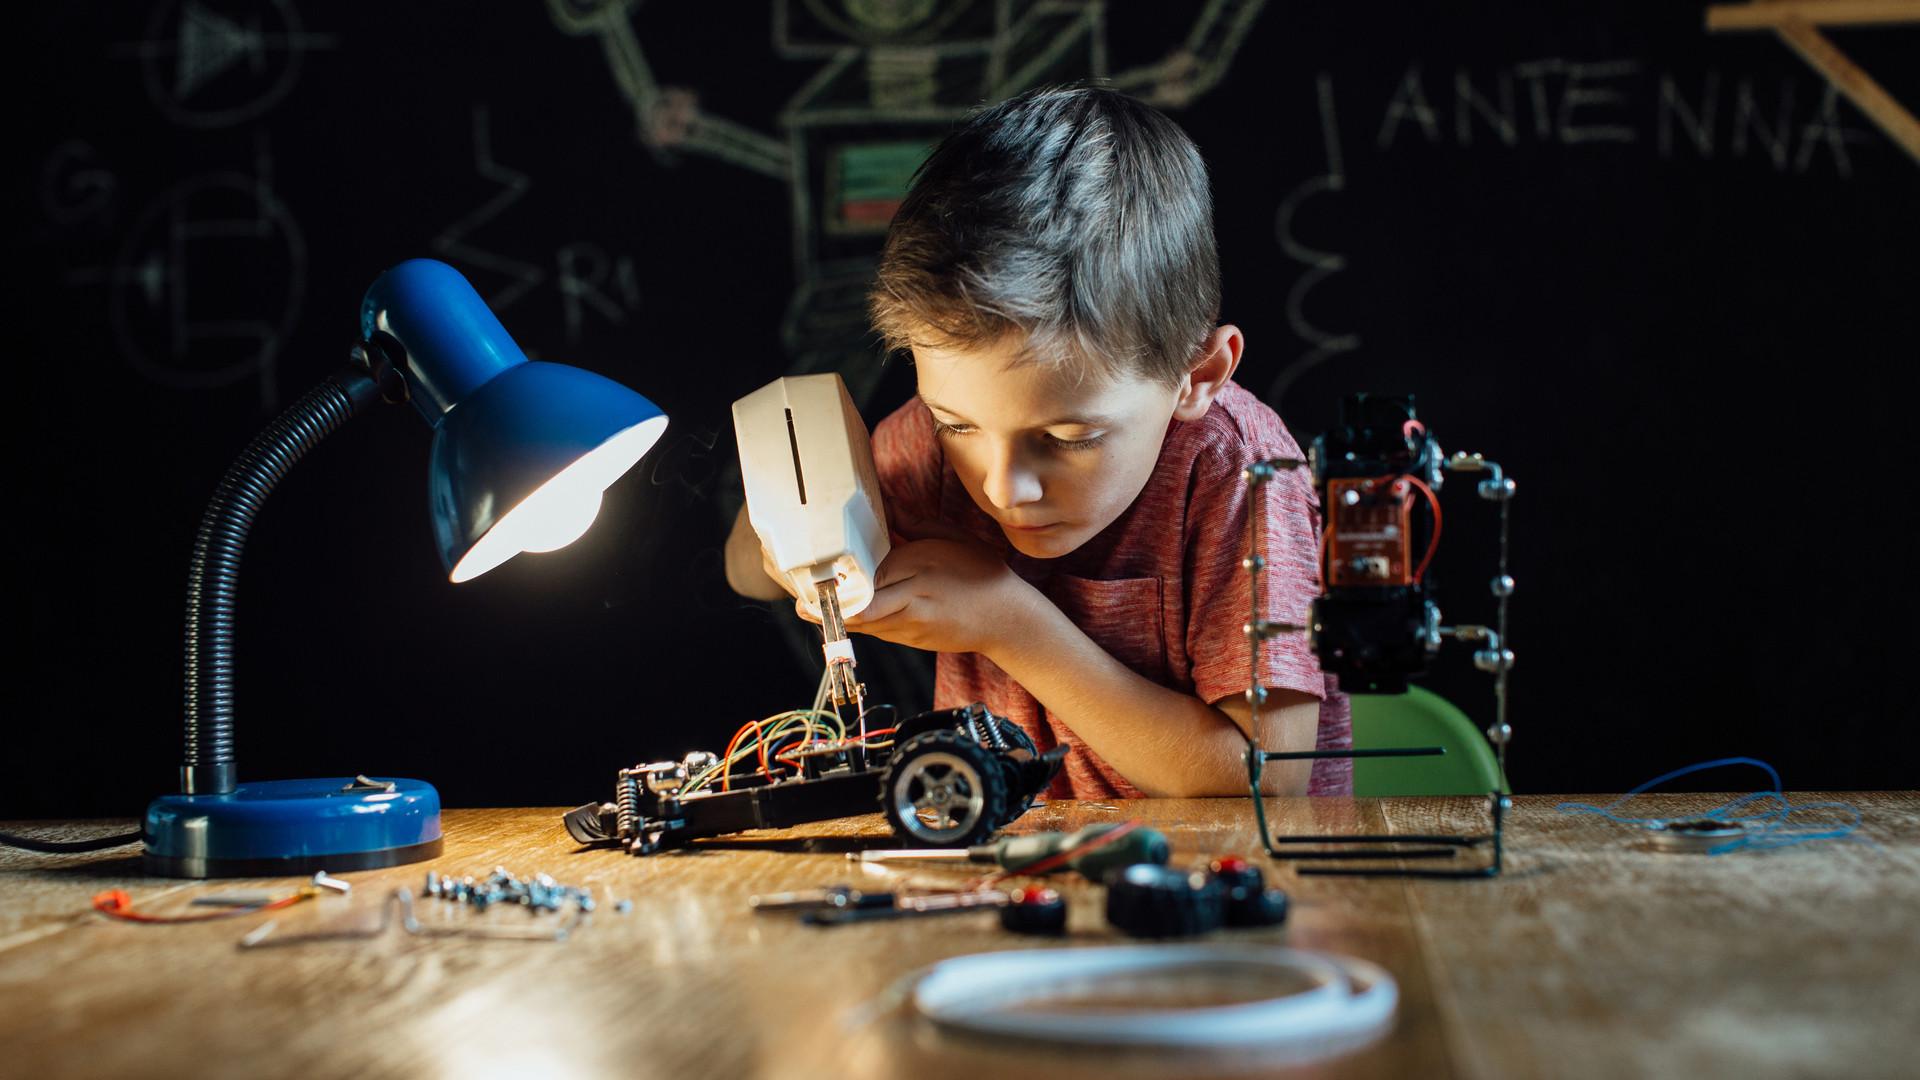 Child, Kid, Creativity, Home, Innovation